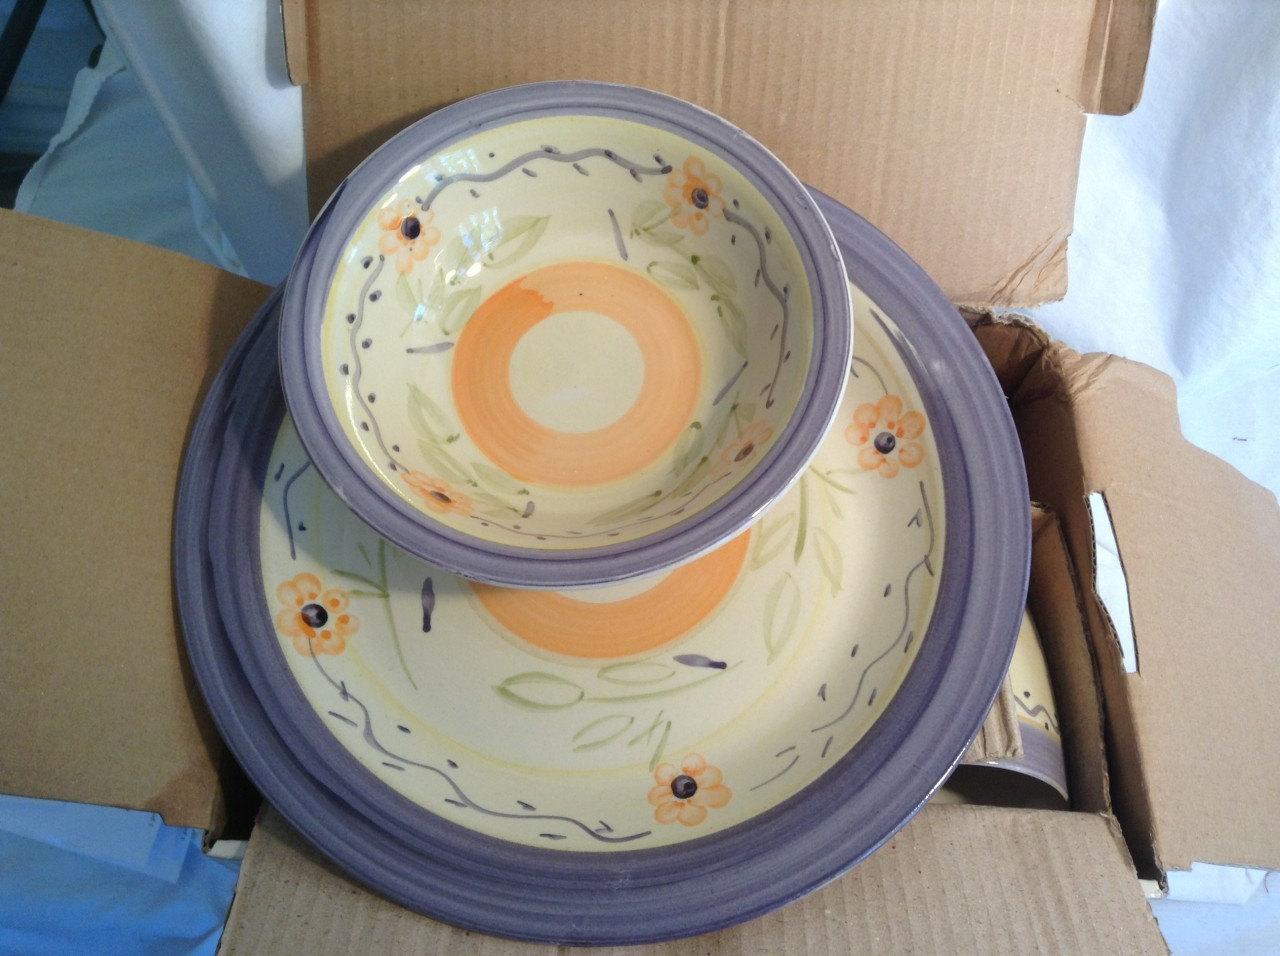 Il fullxfull.543894033 epbf & Moda Fina Spring Lavender 16 piece and similar items